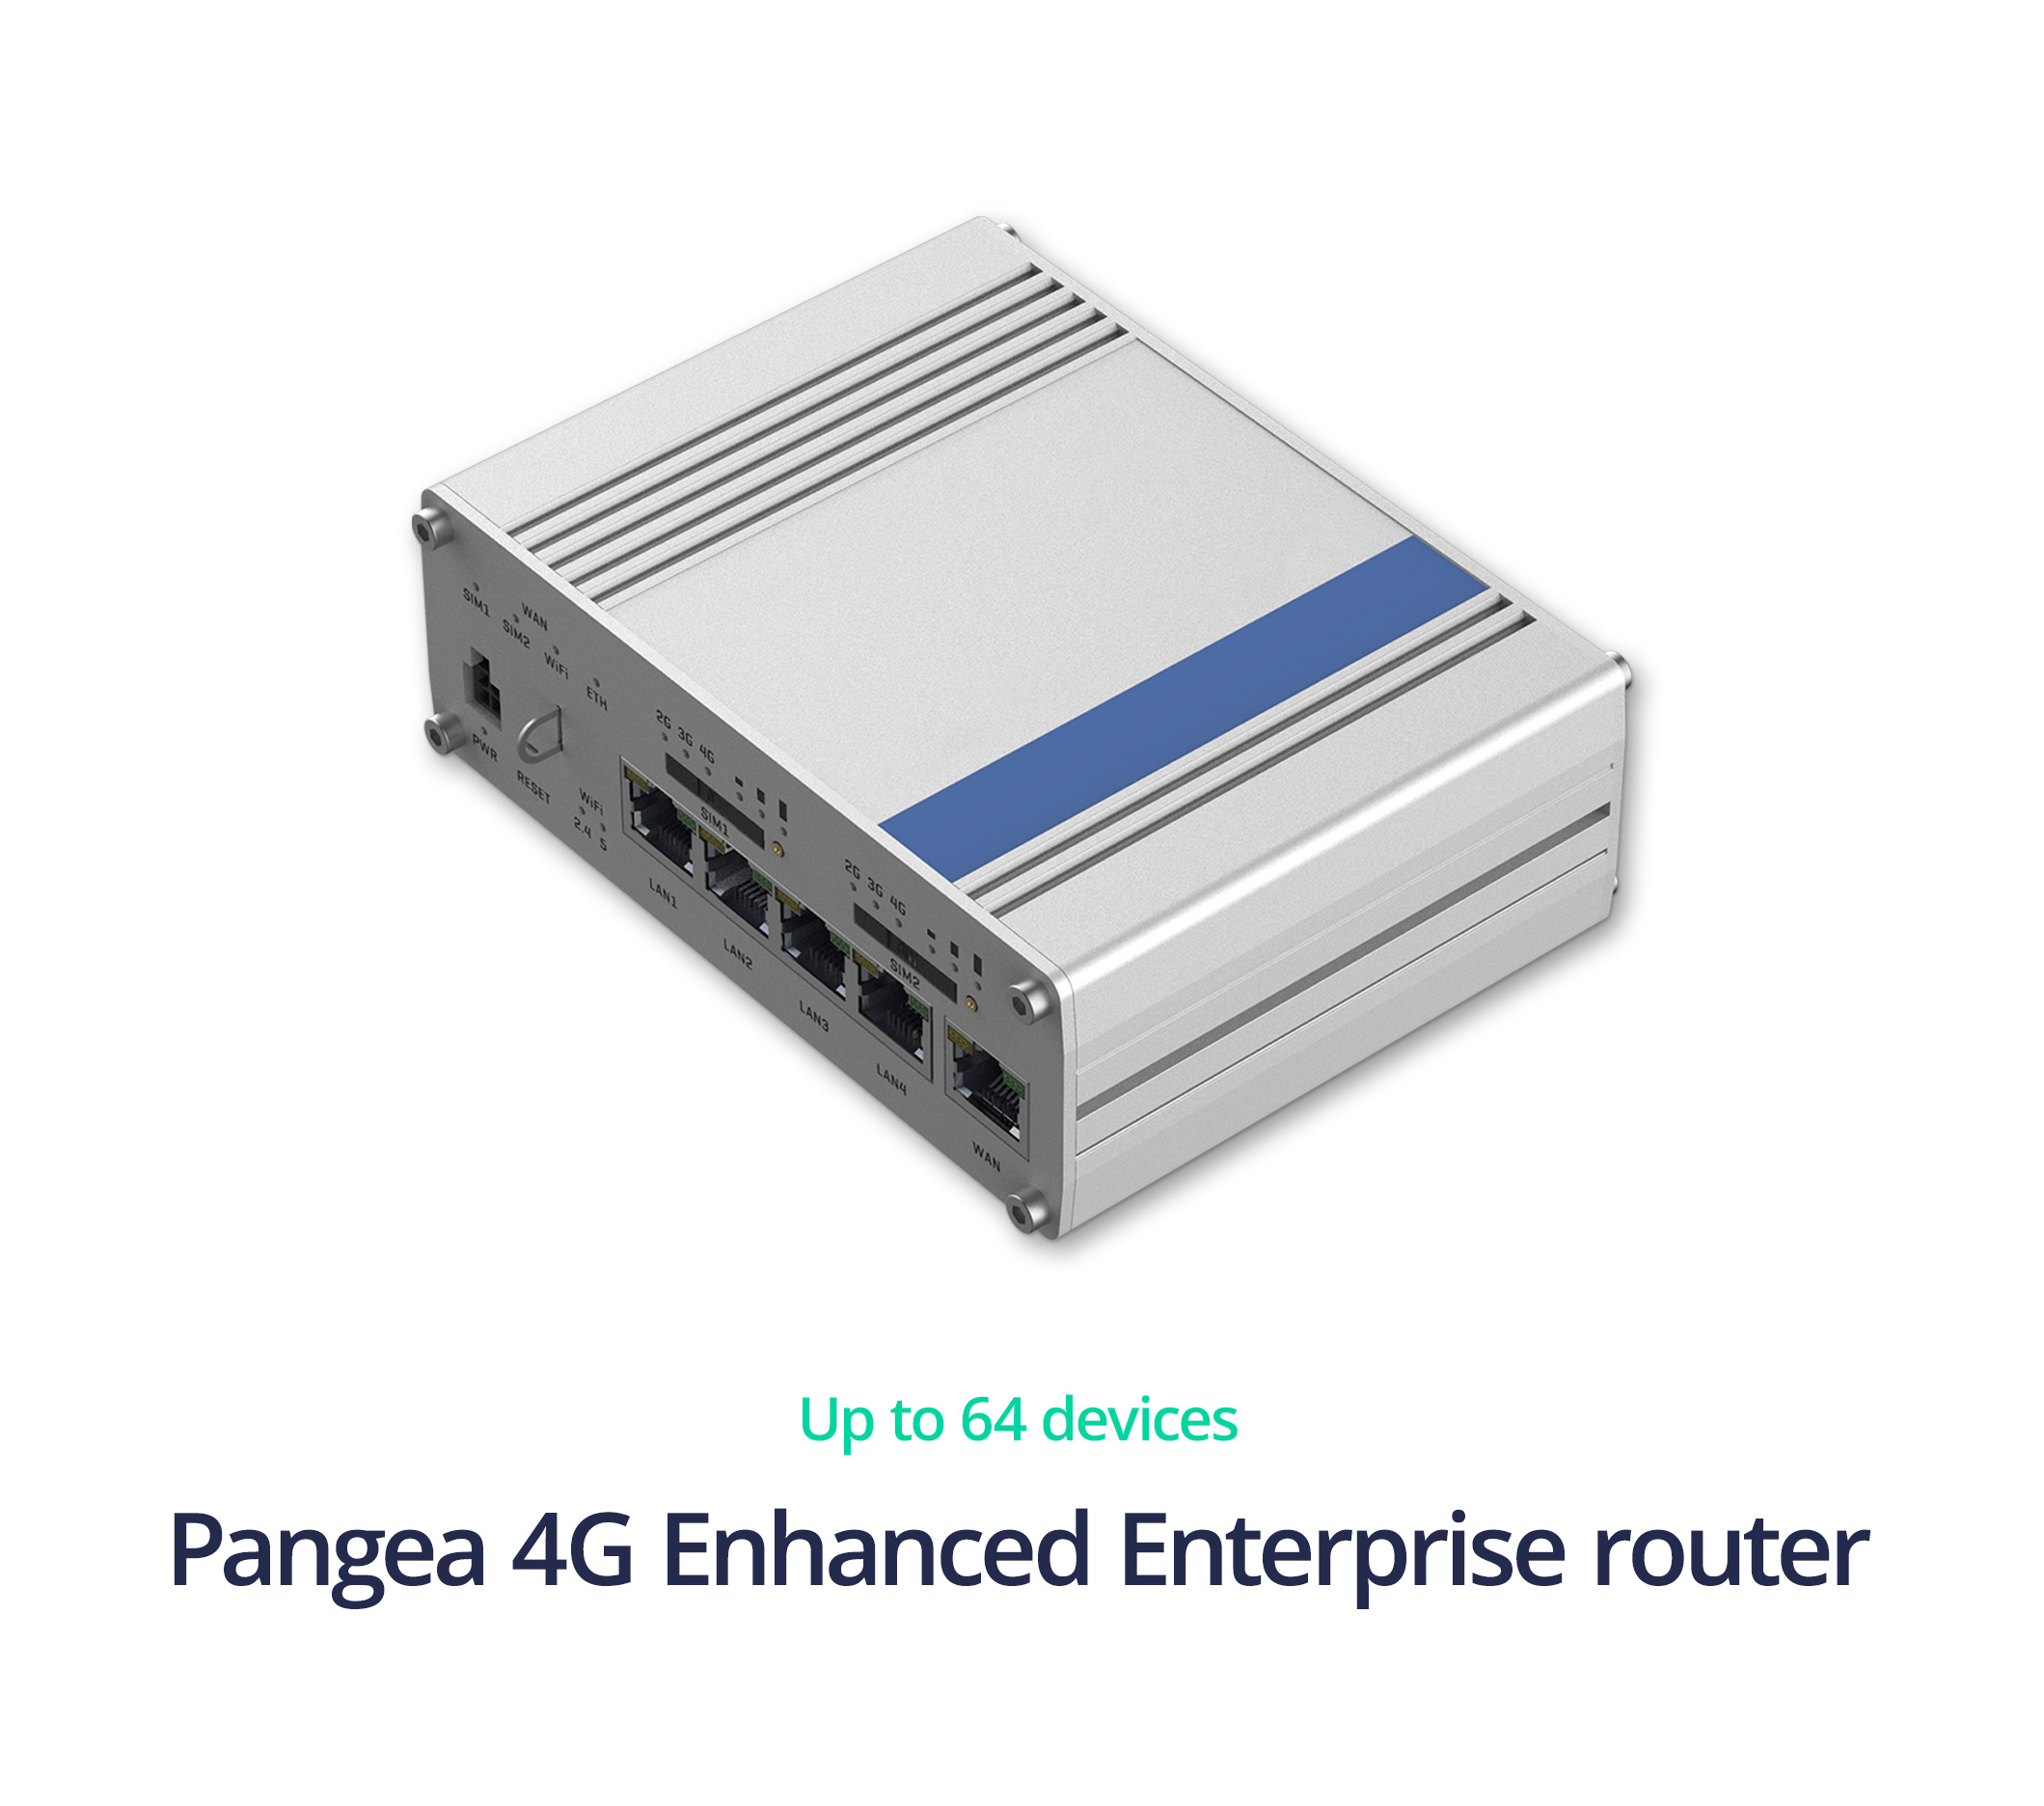 Pangea 5G Enterprise router - Pangea 4G Enhanced Enterprise link